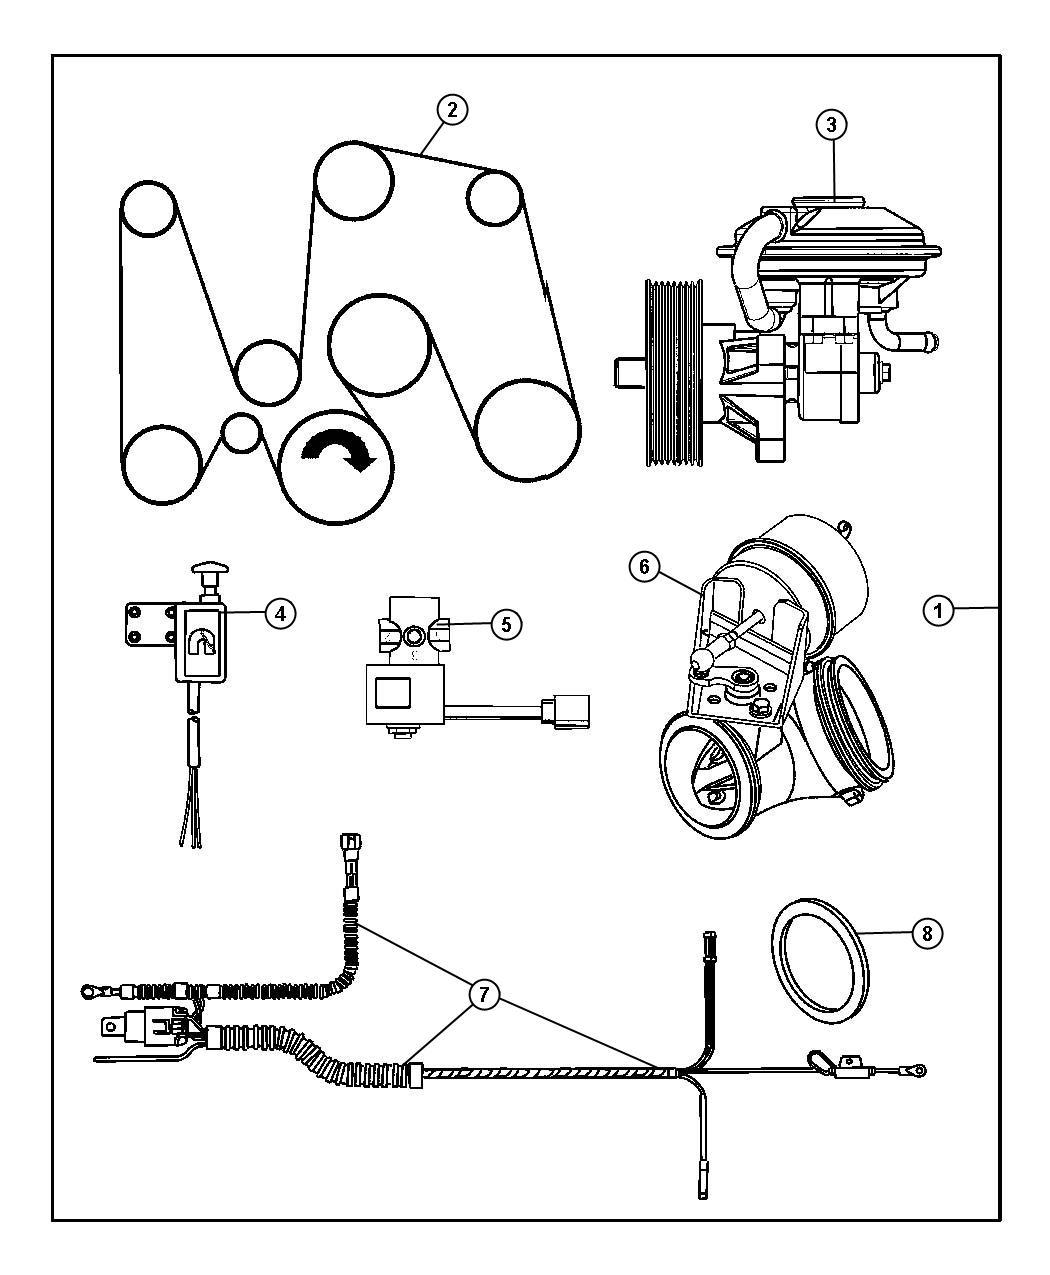 2006 dodge ram 1500 serpentine belt diagram v6 serpentine belt diagram 2006 dodge ram 1500 wiring  serpentine belt diagram 2006 dodge ram